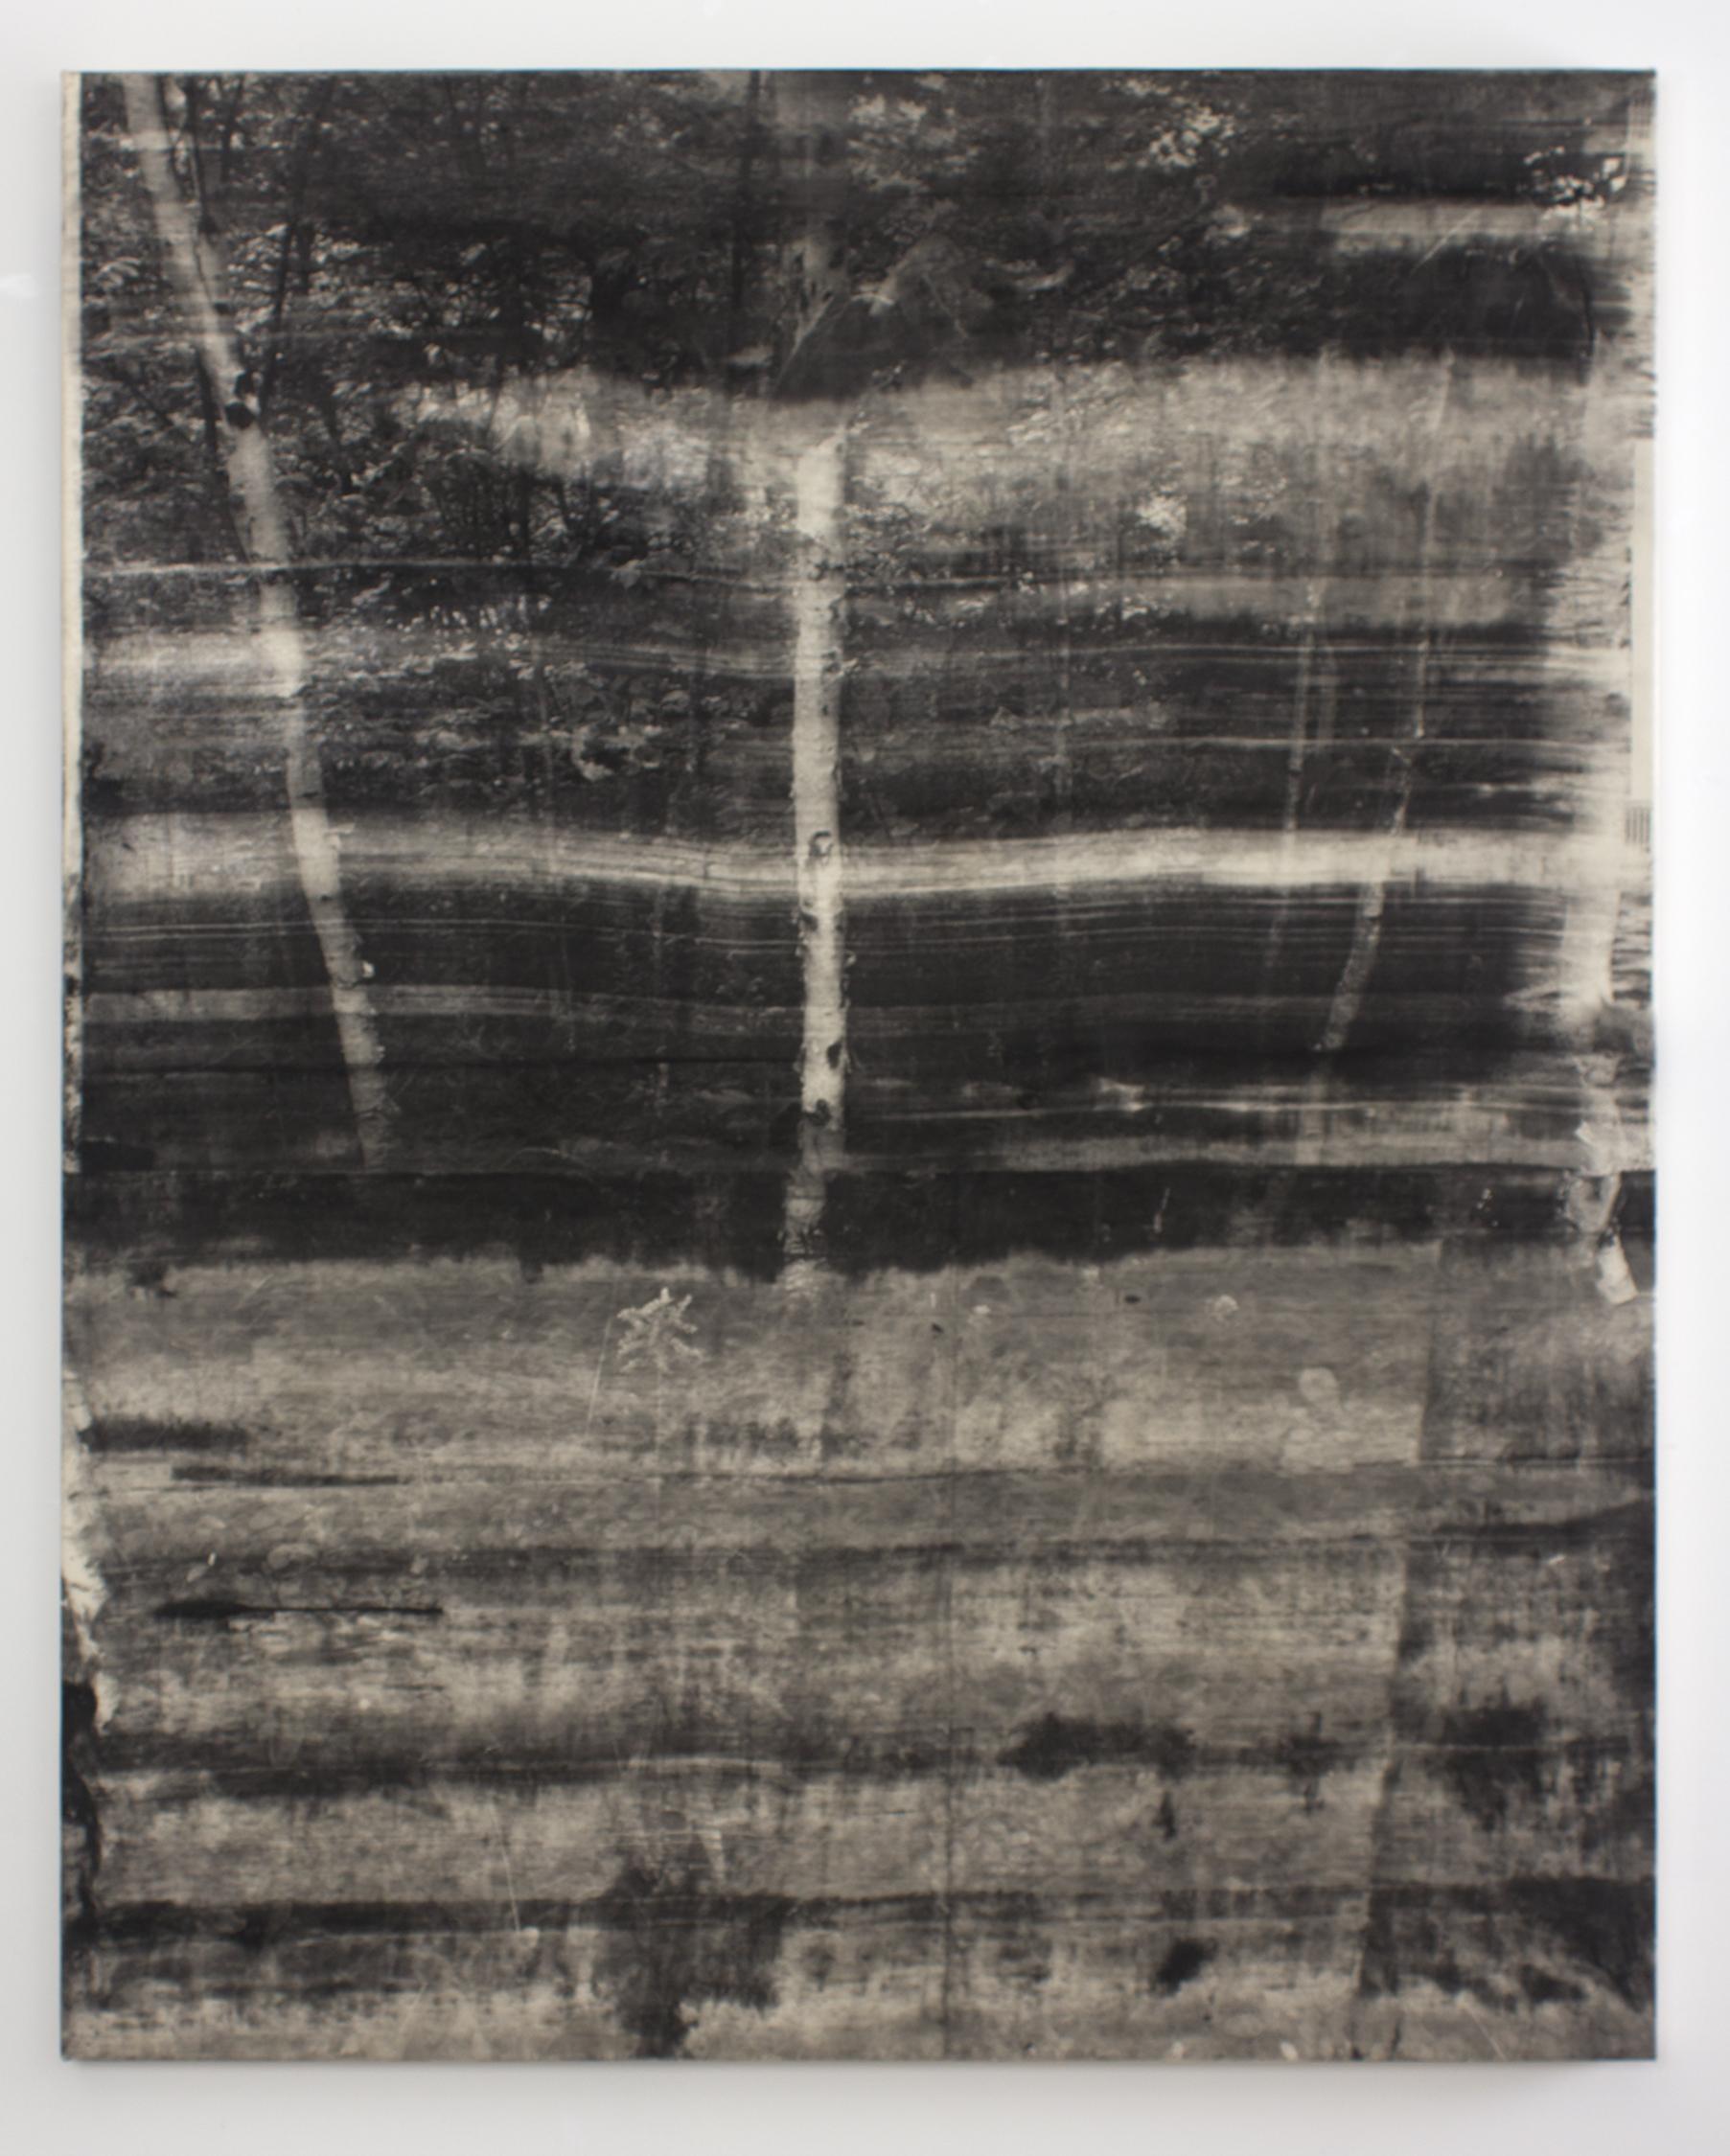 Landscape No. 7 , 2015 copy-machine toner on canvas 50 x 65 in